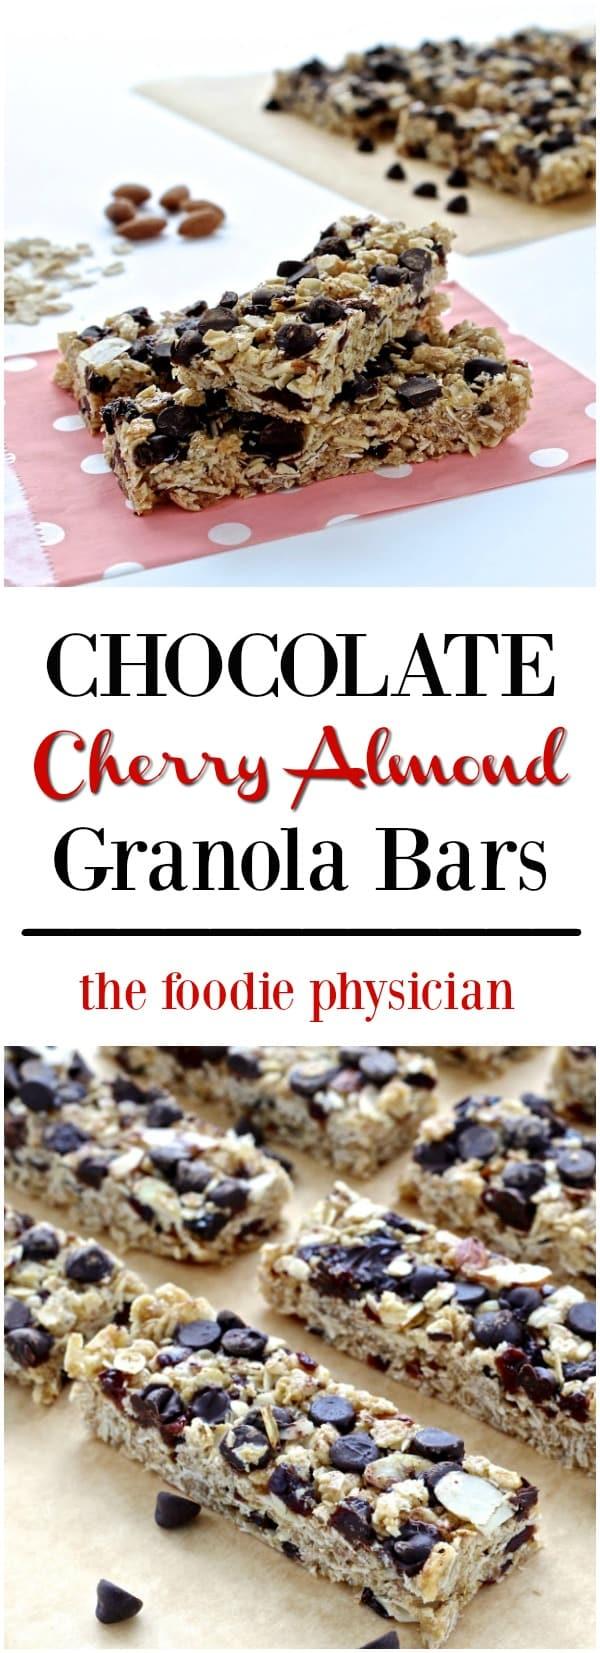 No-Bake Chocolate Cherry Almond Granola Bars | @foodiephysician